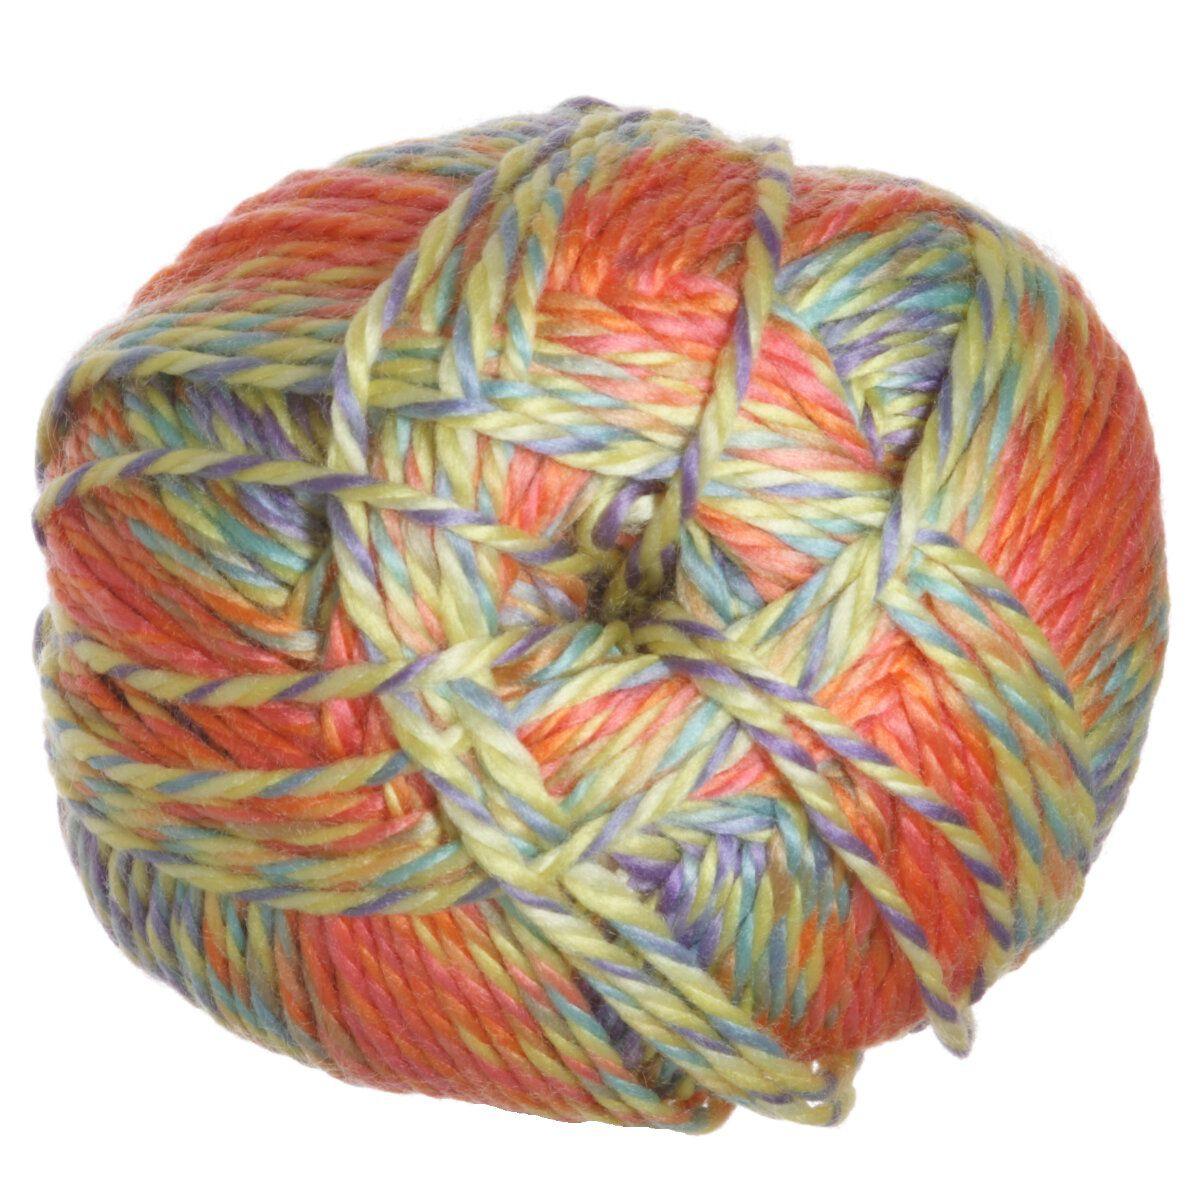 Knitting Wheel Projects : Cascade big wheel yarn project ideas at jimmy beans wool